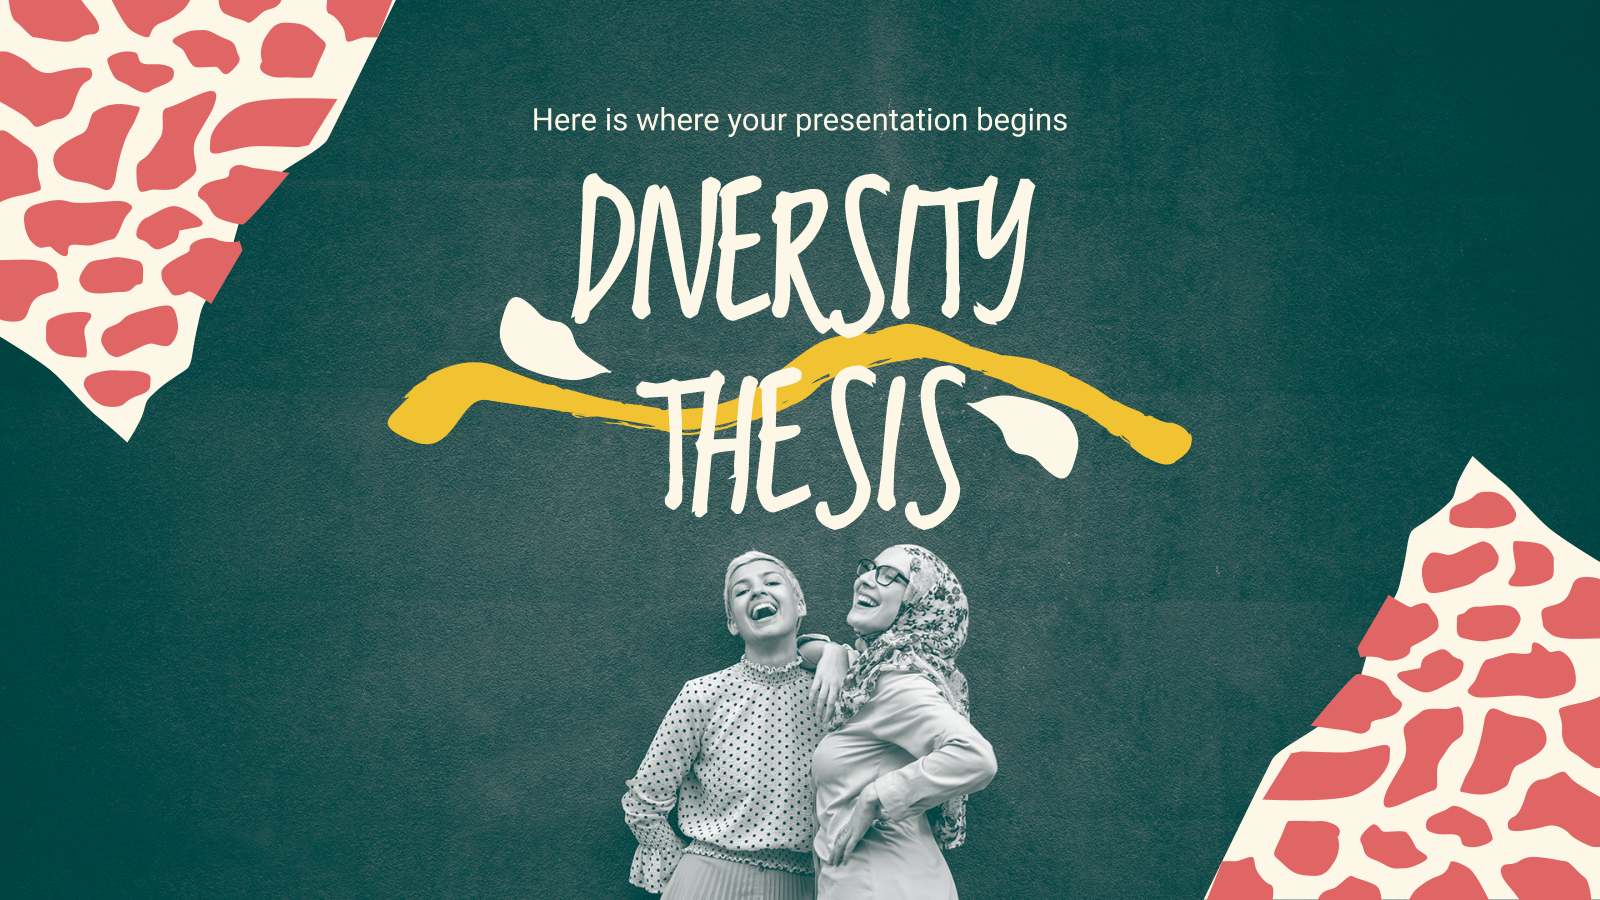 Diversity Thesis presentation template